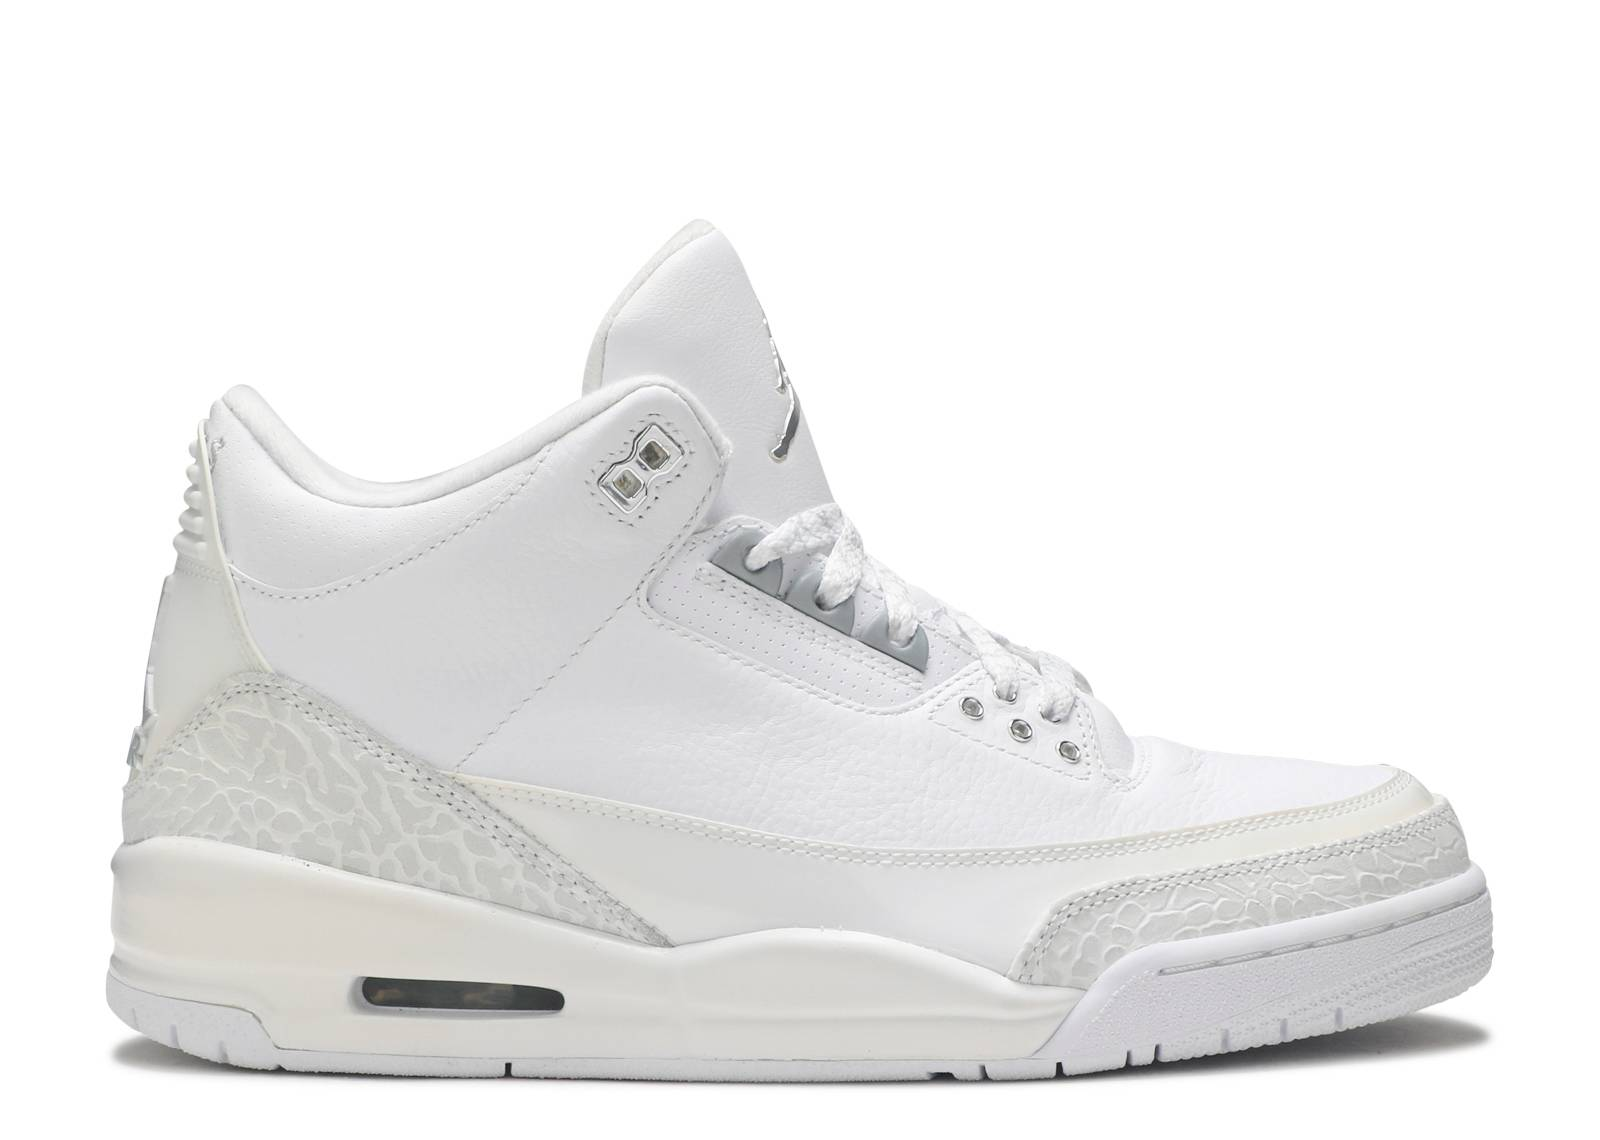 size 40 c2362 f2d7b Air Jordan 3 Retro